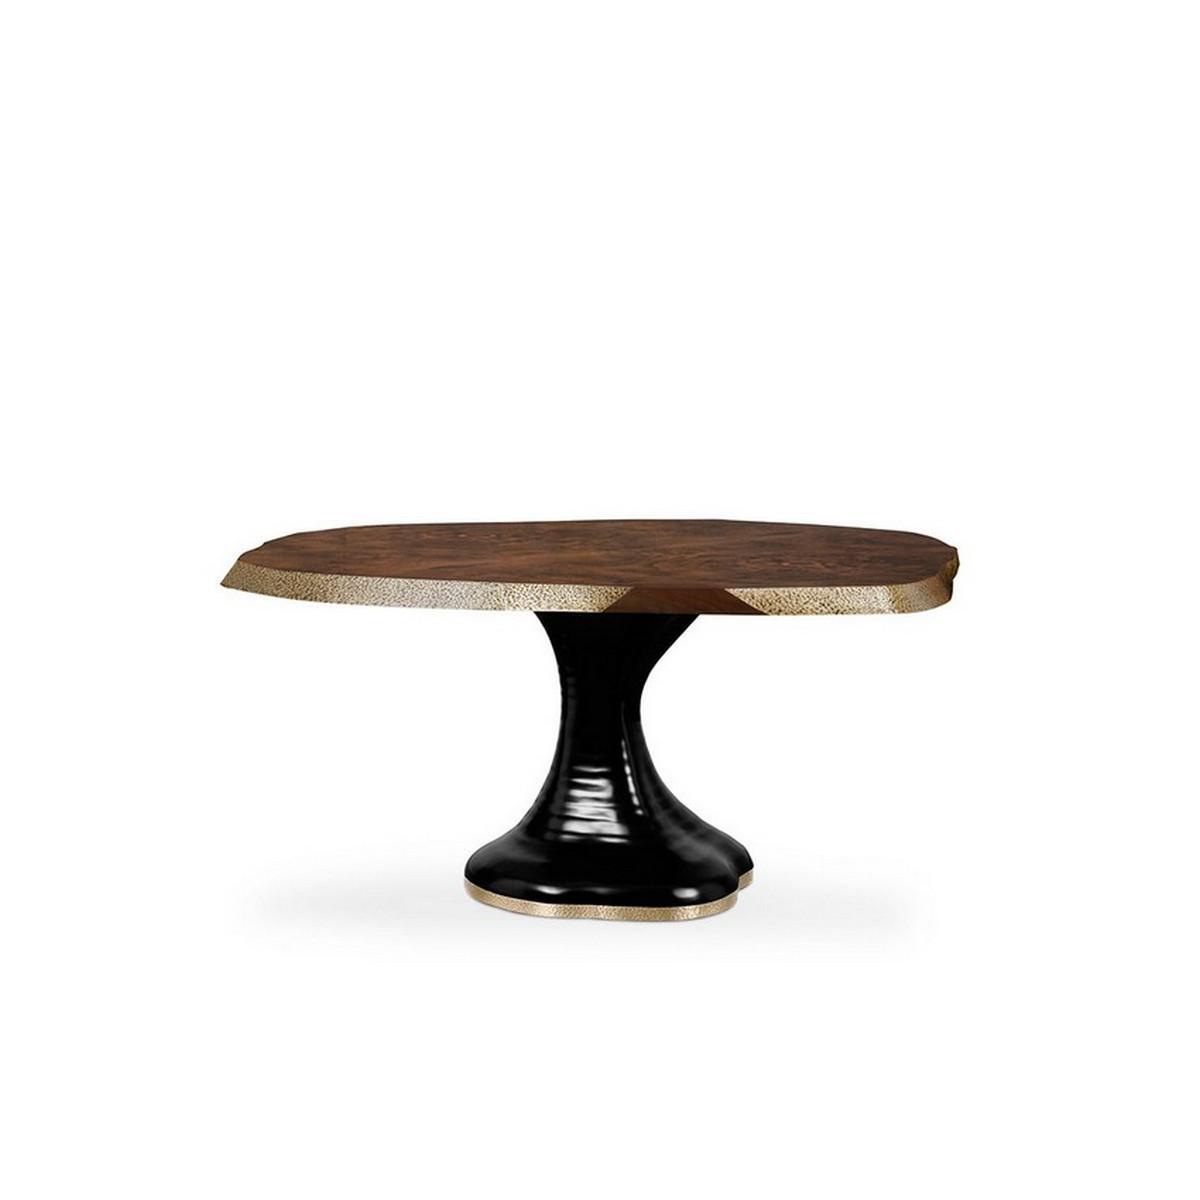 Diseños de Interiores inspirados en Naturaleza: ideas para cambiar un proyecto diseño de interiores Diseño de Interiores inspirados en Naturaleza: ideas para cambiar un proyecto bb plateau dining table 2 imagem principal